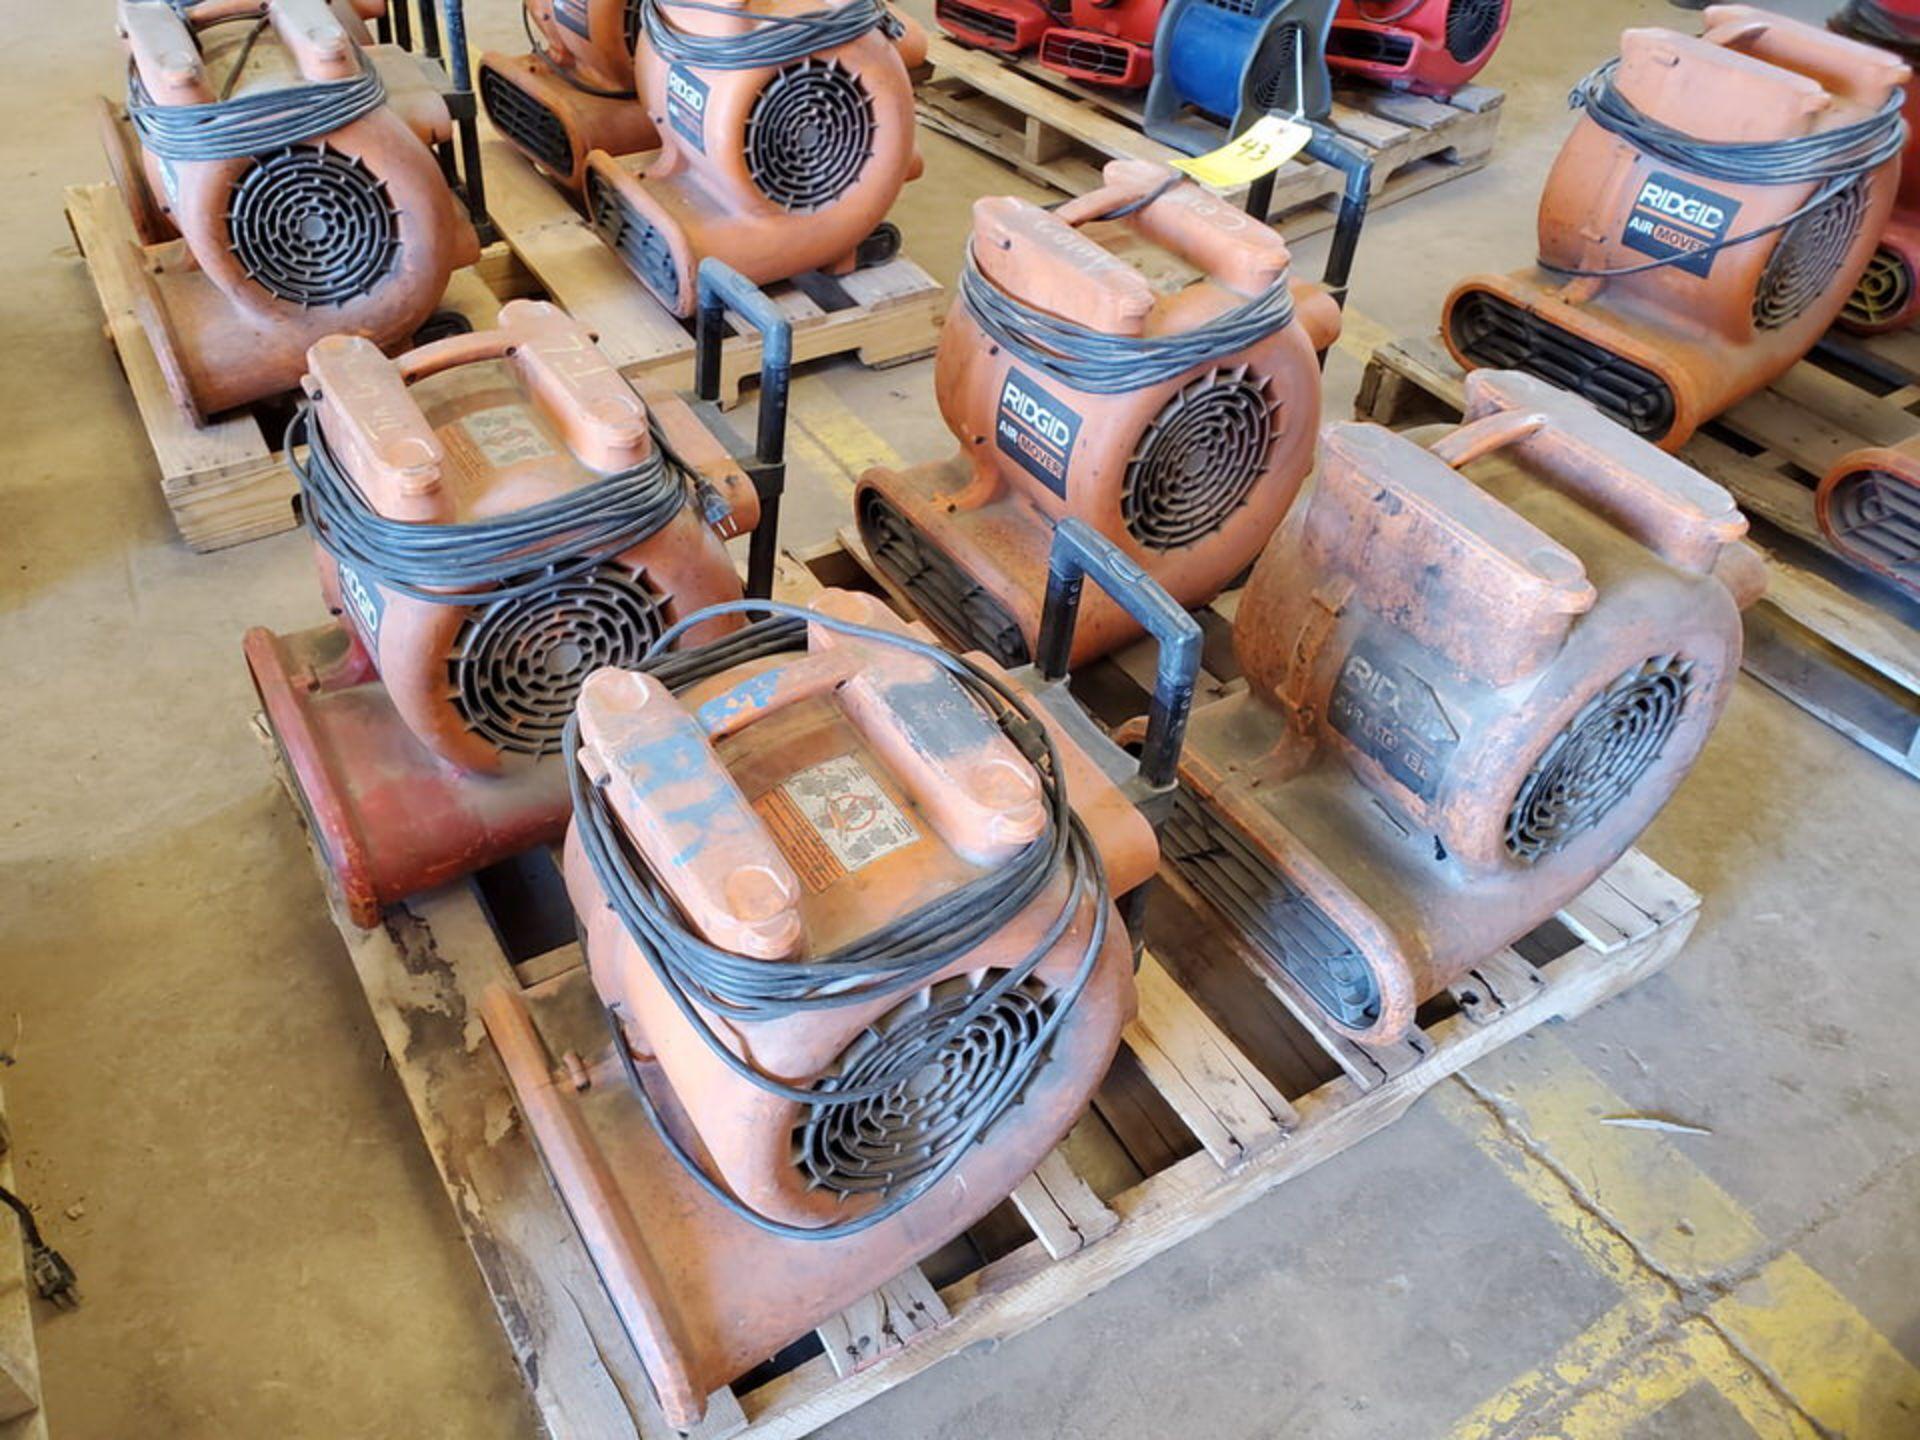 Ridgid (4) Air Blowers 120V, 3A, 60HZ